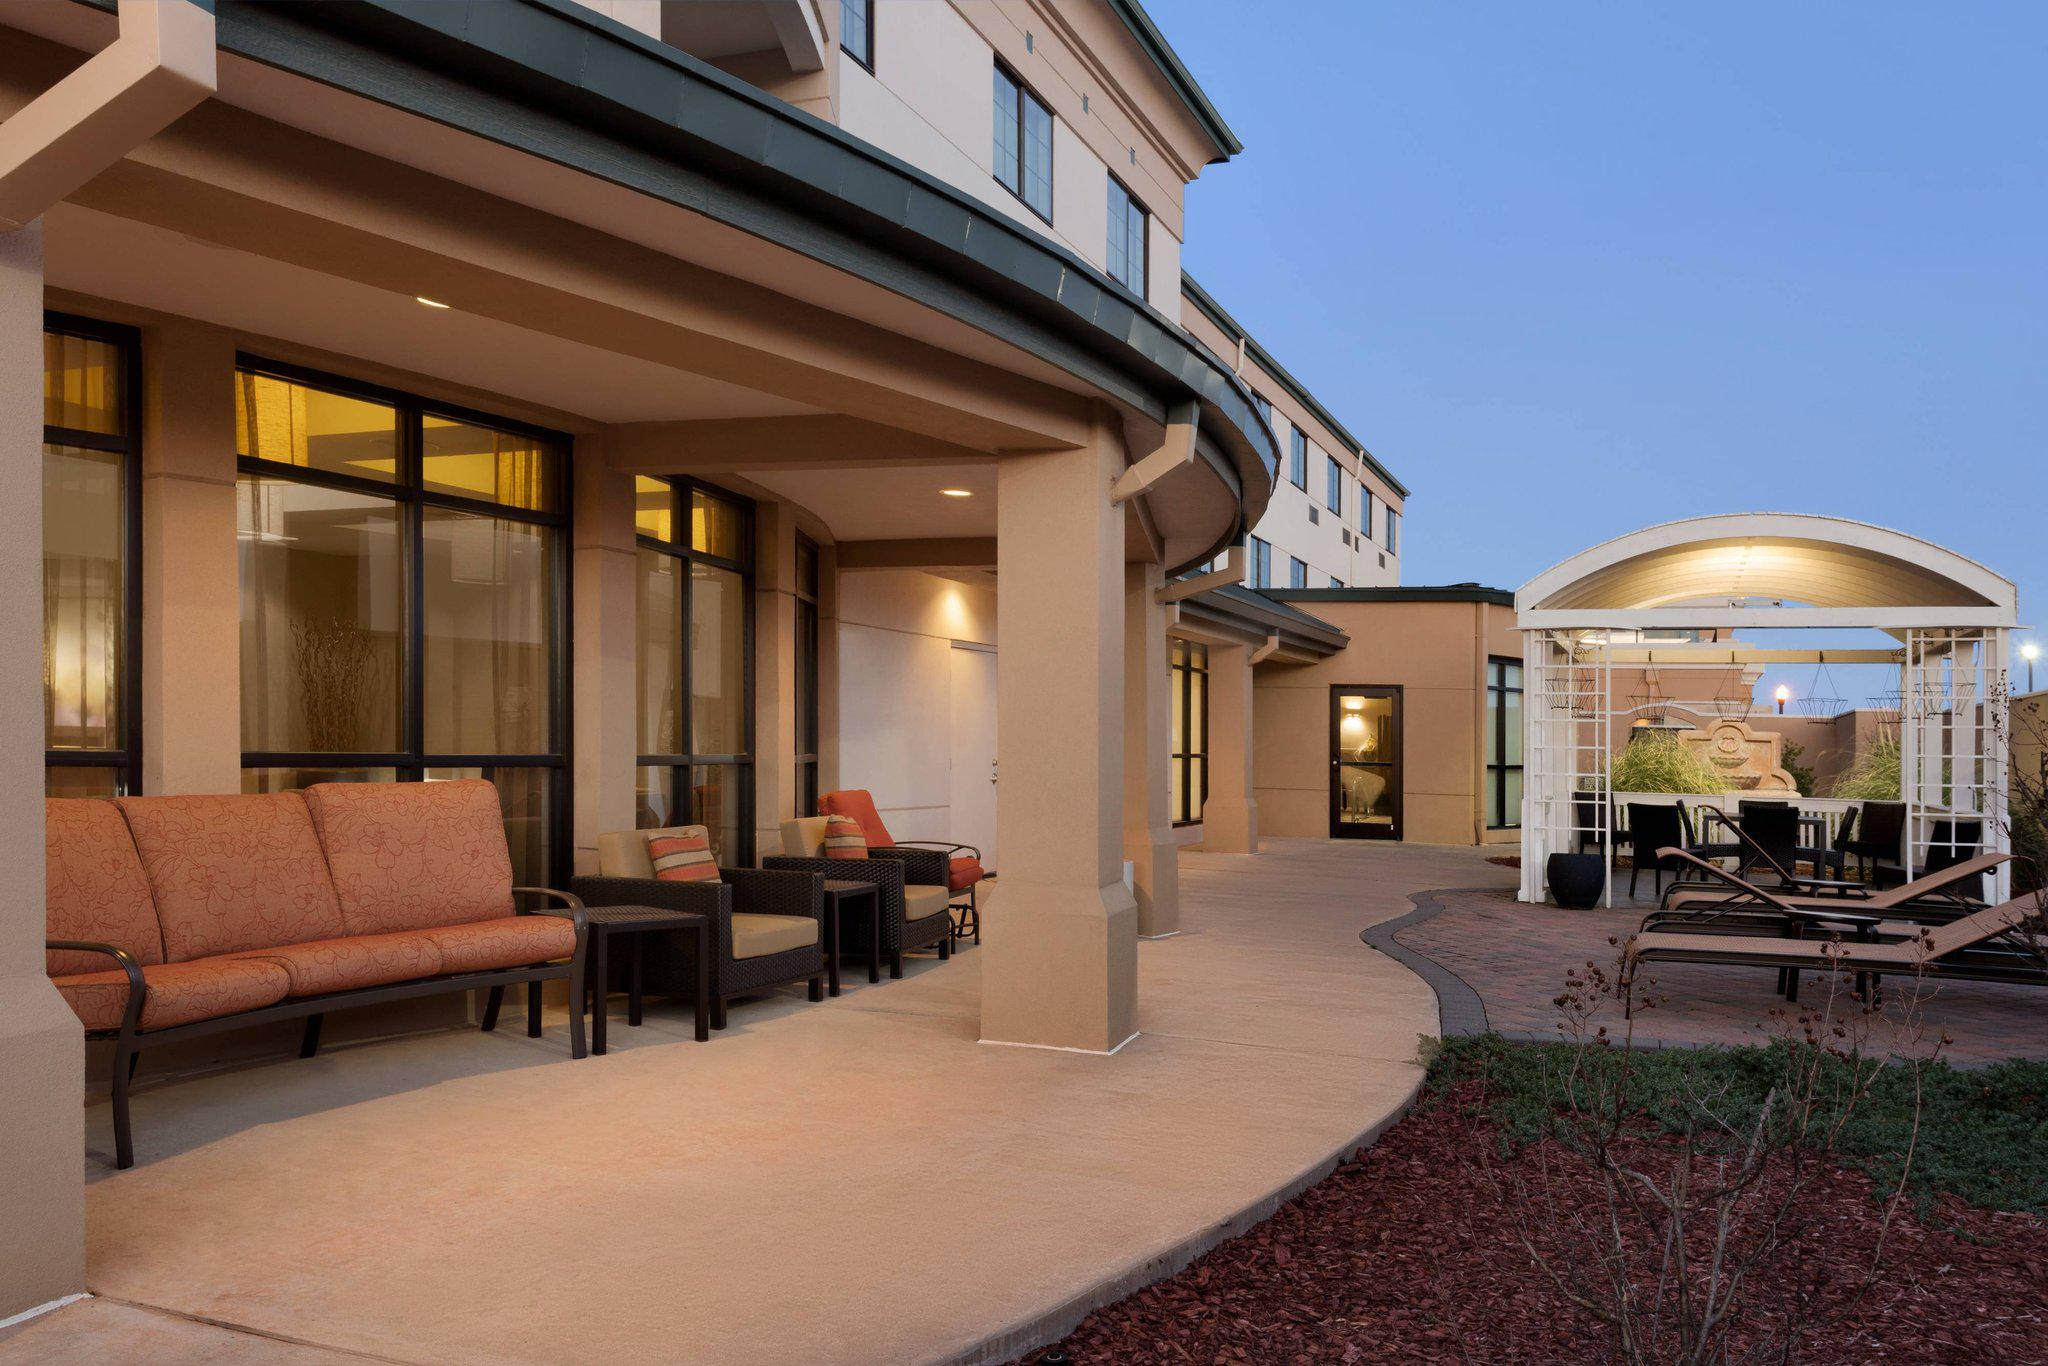 Courtyard by Marriott Oklahoma City North/Quail Springs